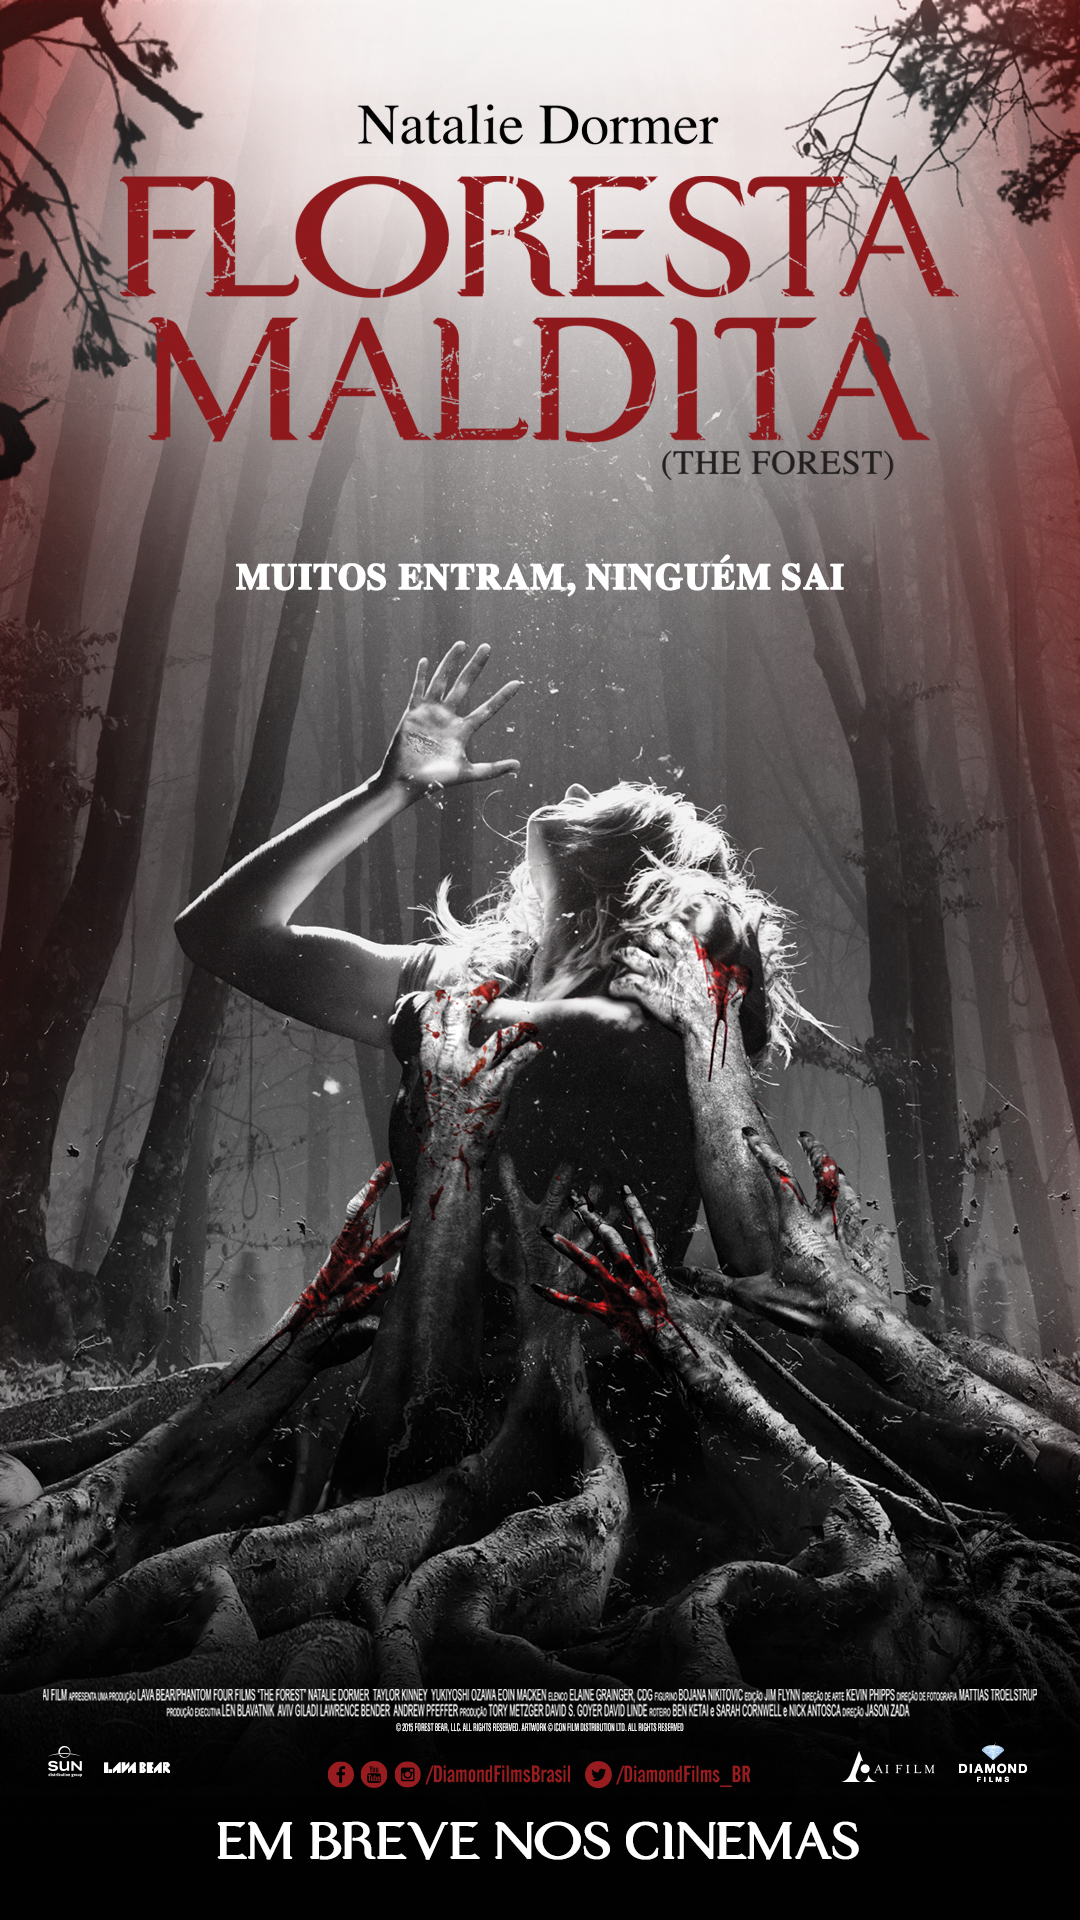 Floresta Do Mal Online regarding floresta maldita - filme 2016 - adorocinema